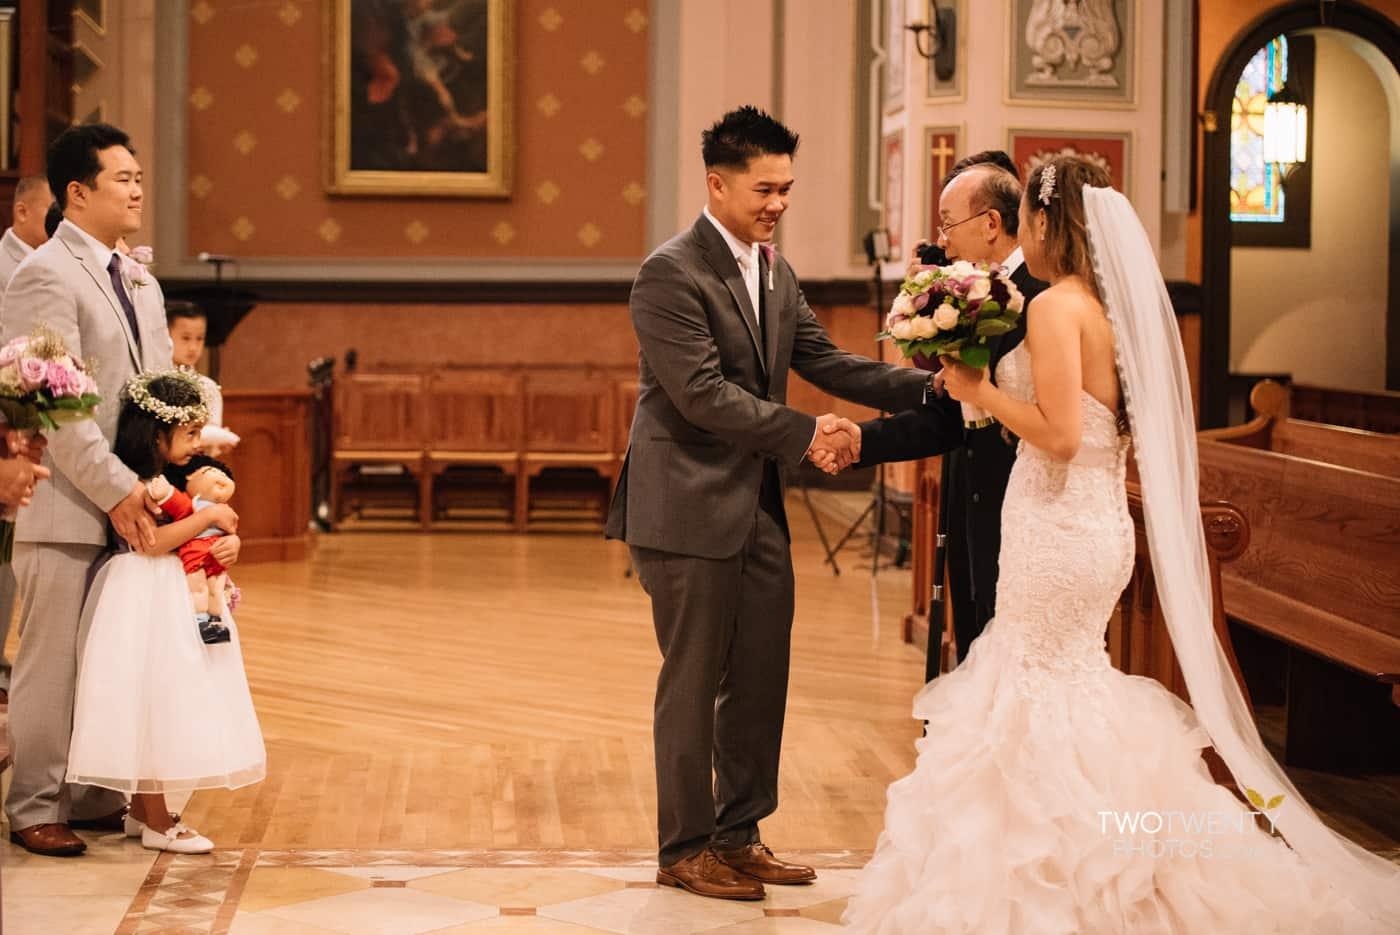 cathedral-of-the-sacred-sacrament-downtown-sacramento-wedding-photographer-11